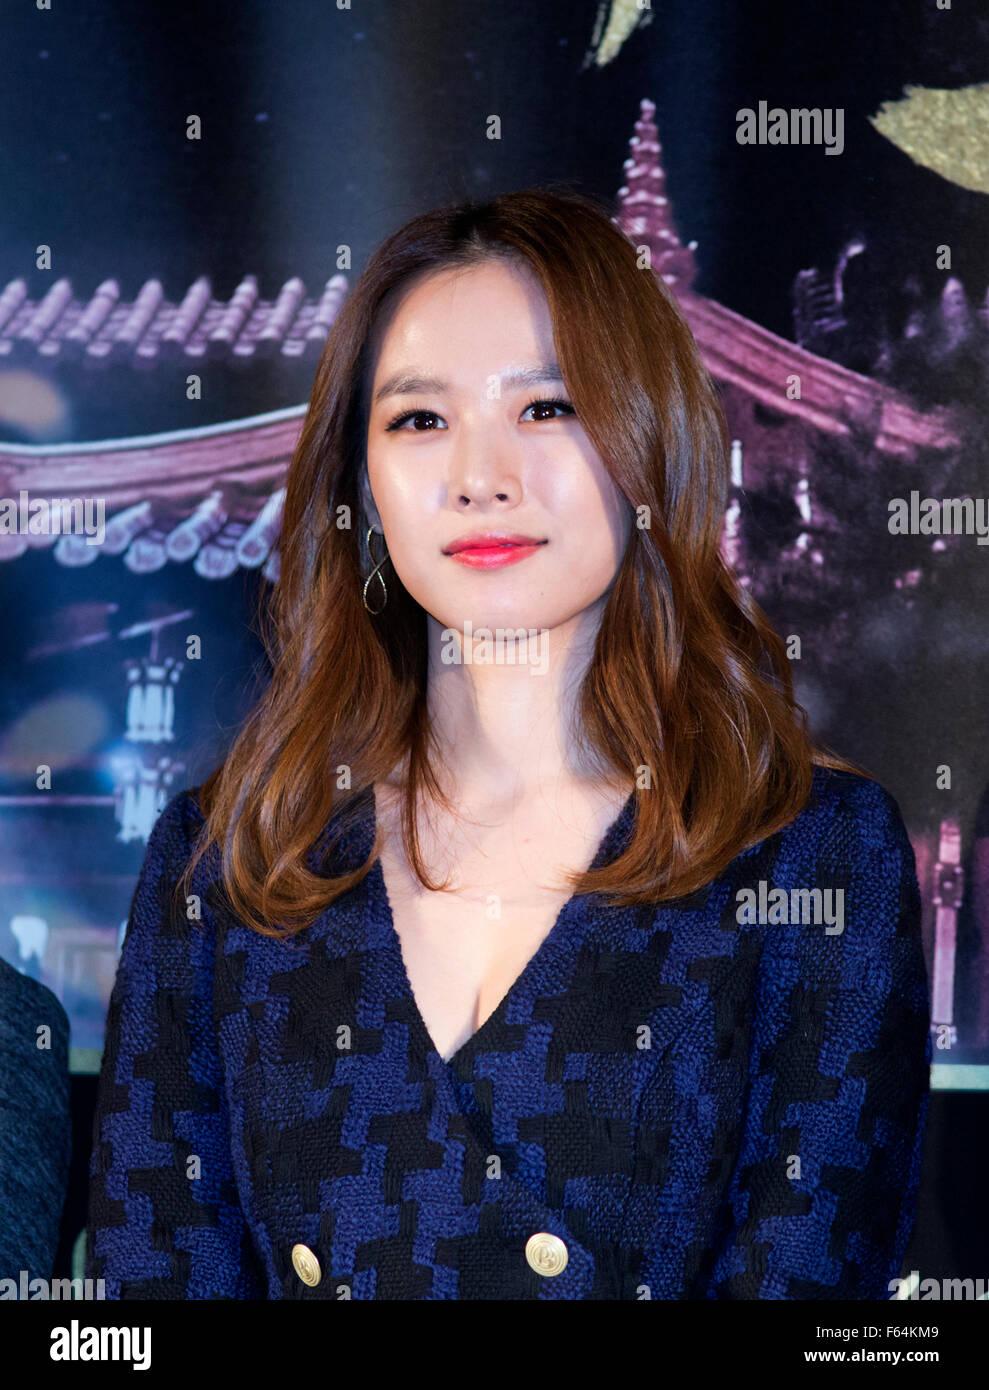 Jo yoon hee and lee hee joon dating games